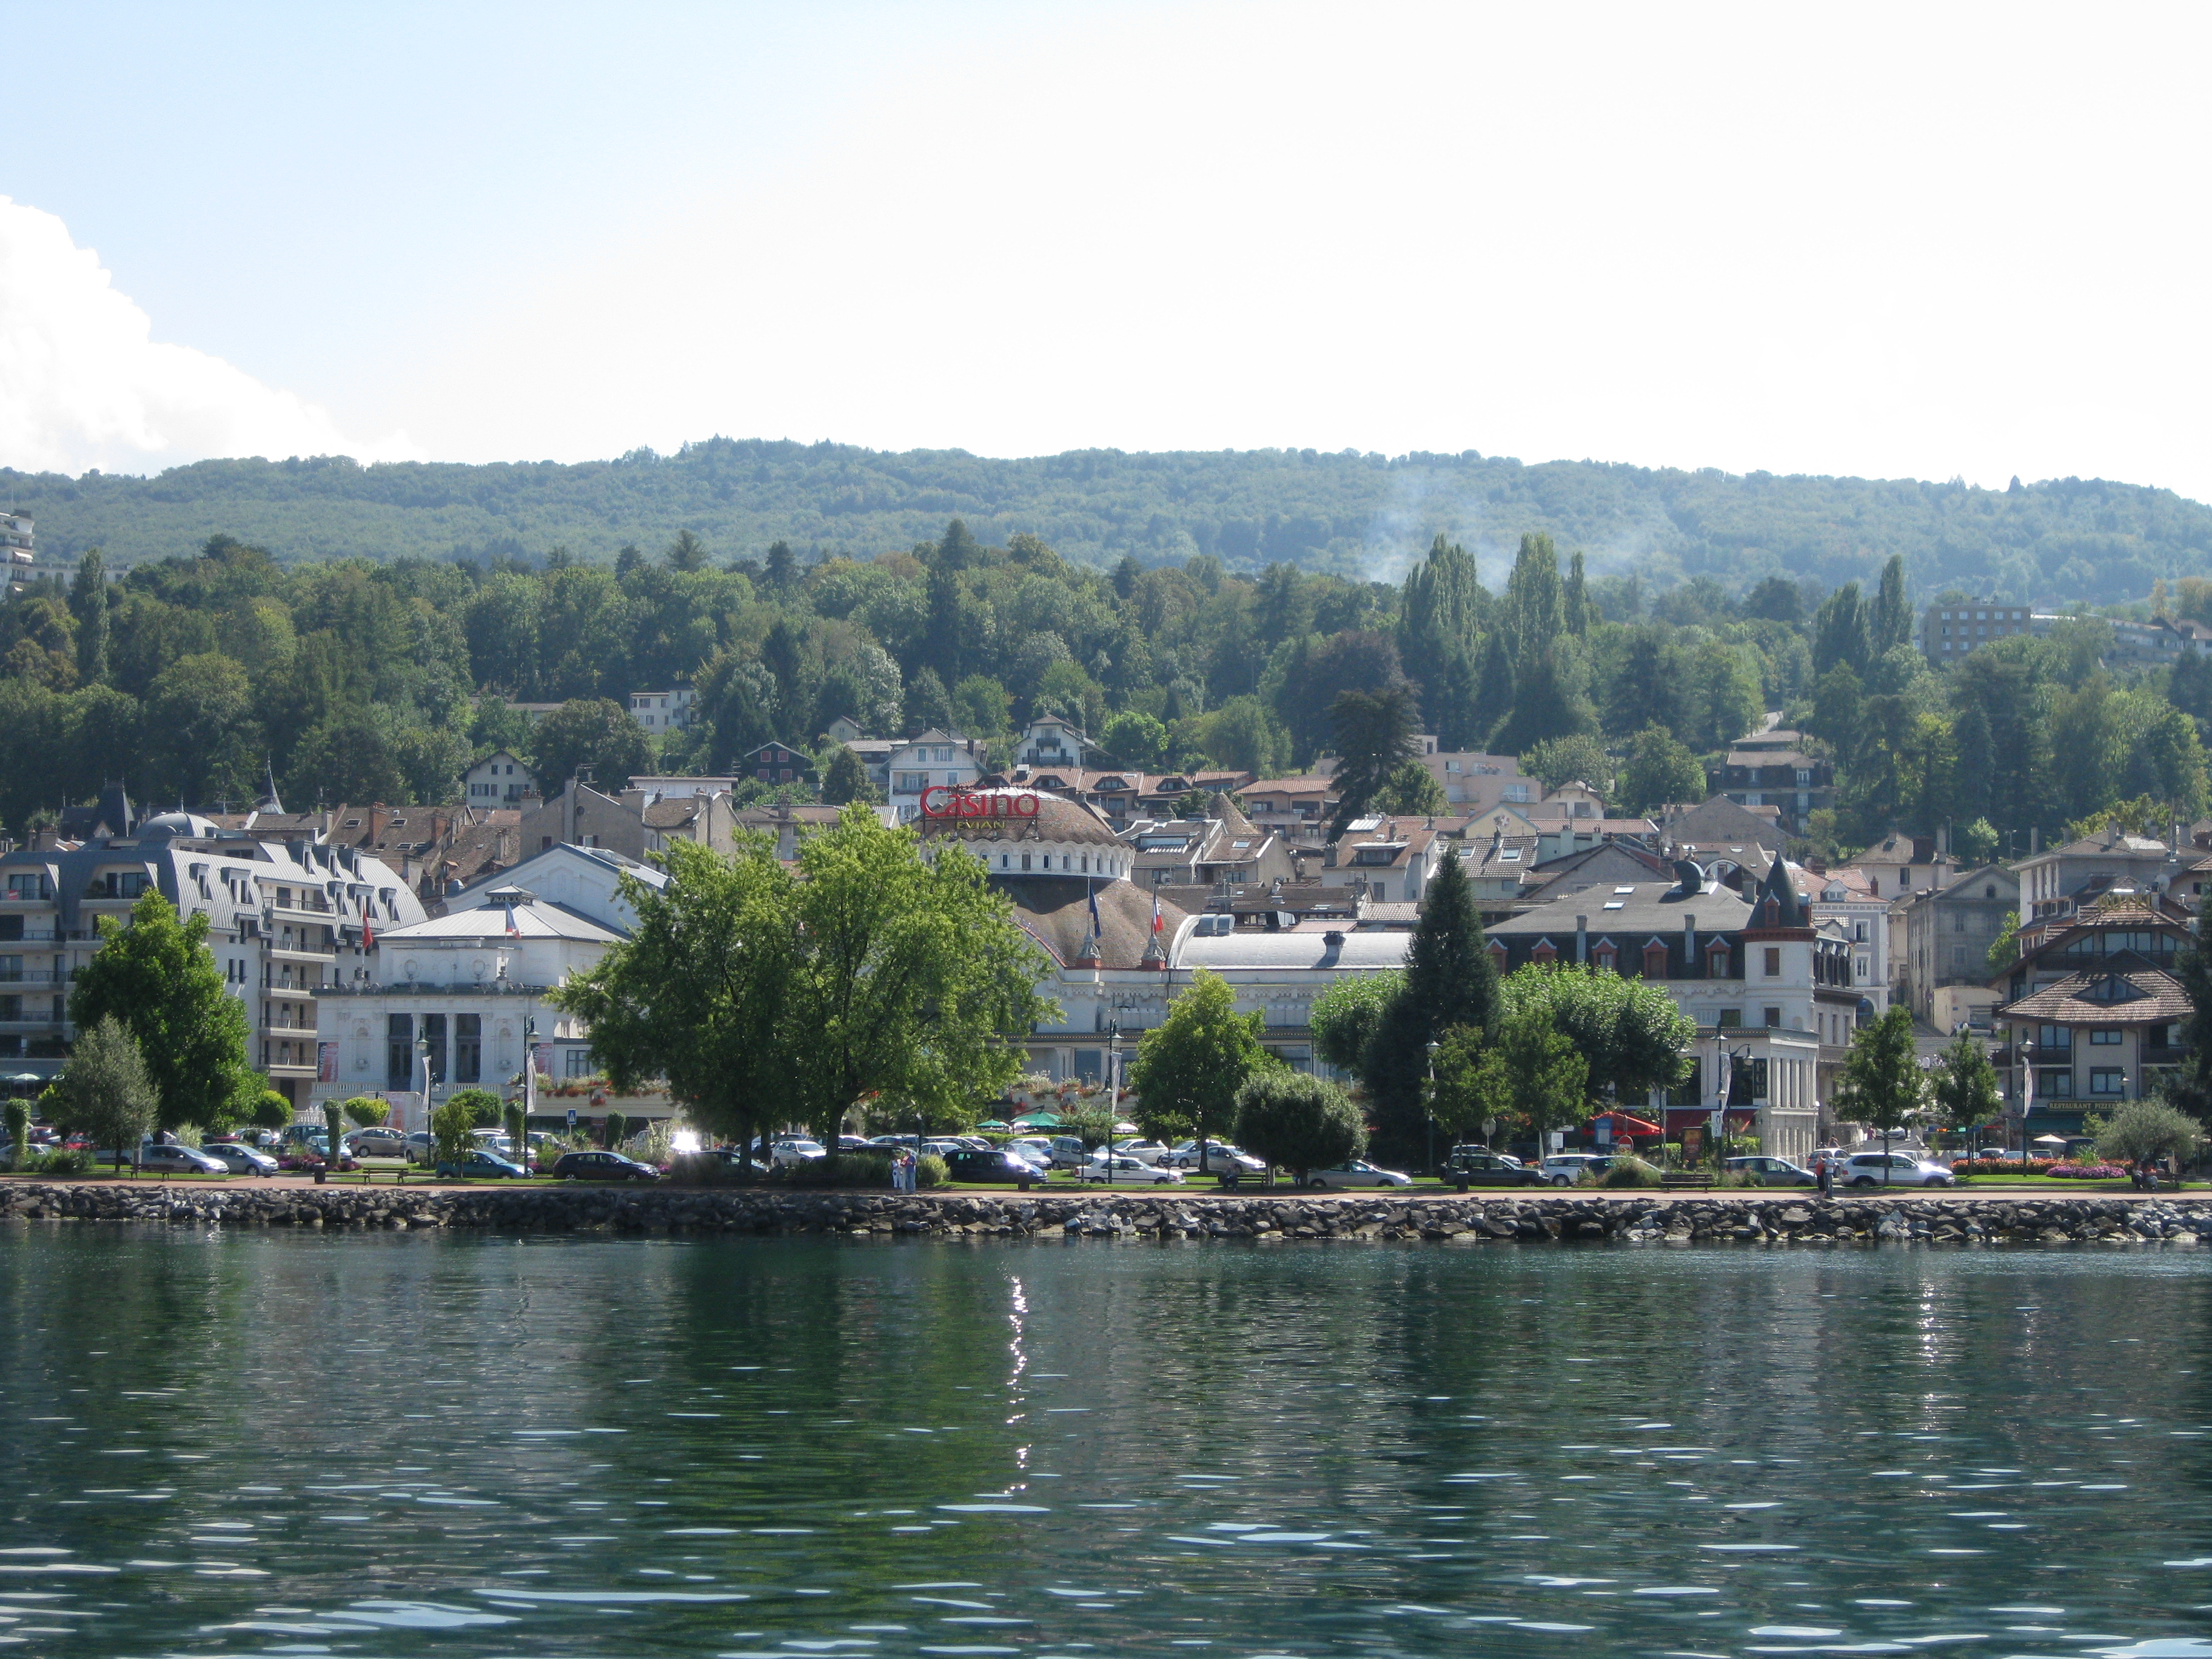 Calendrier Evian.Evian Les Bains Wikipedia